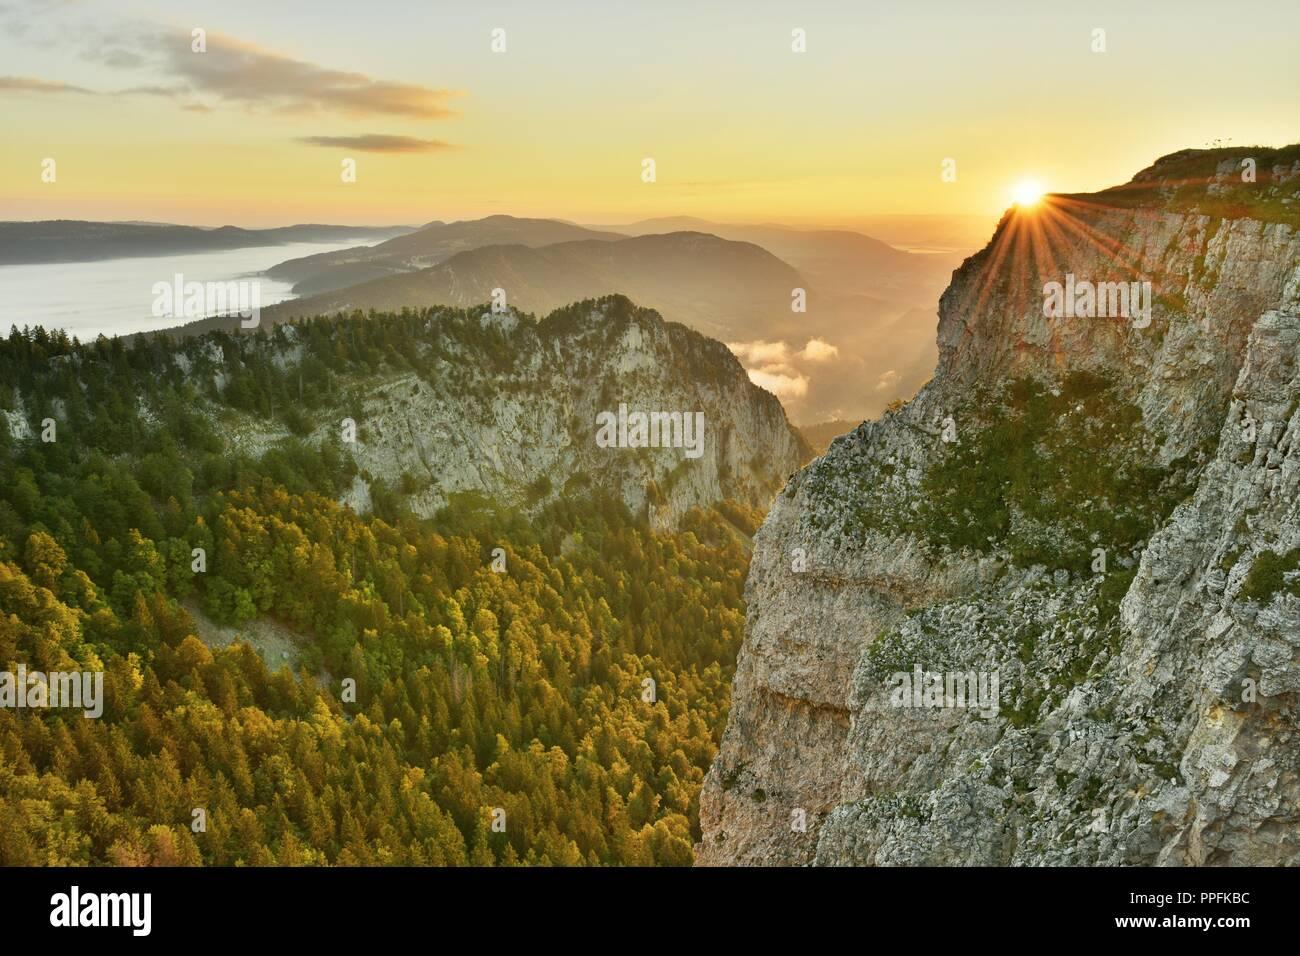 Creux du Van, rock face at sunrise, Le Soliat, canton of Jura, Switzerland - Stock Image